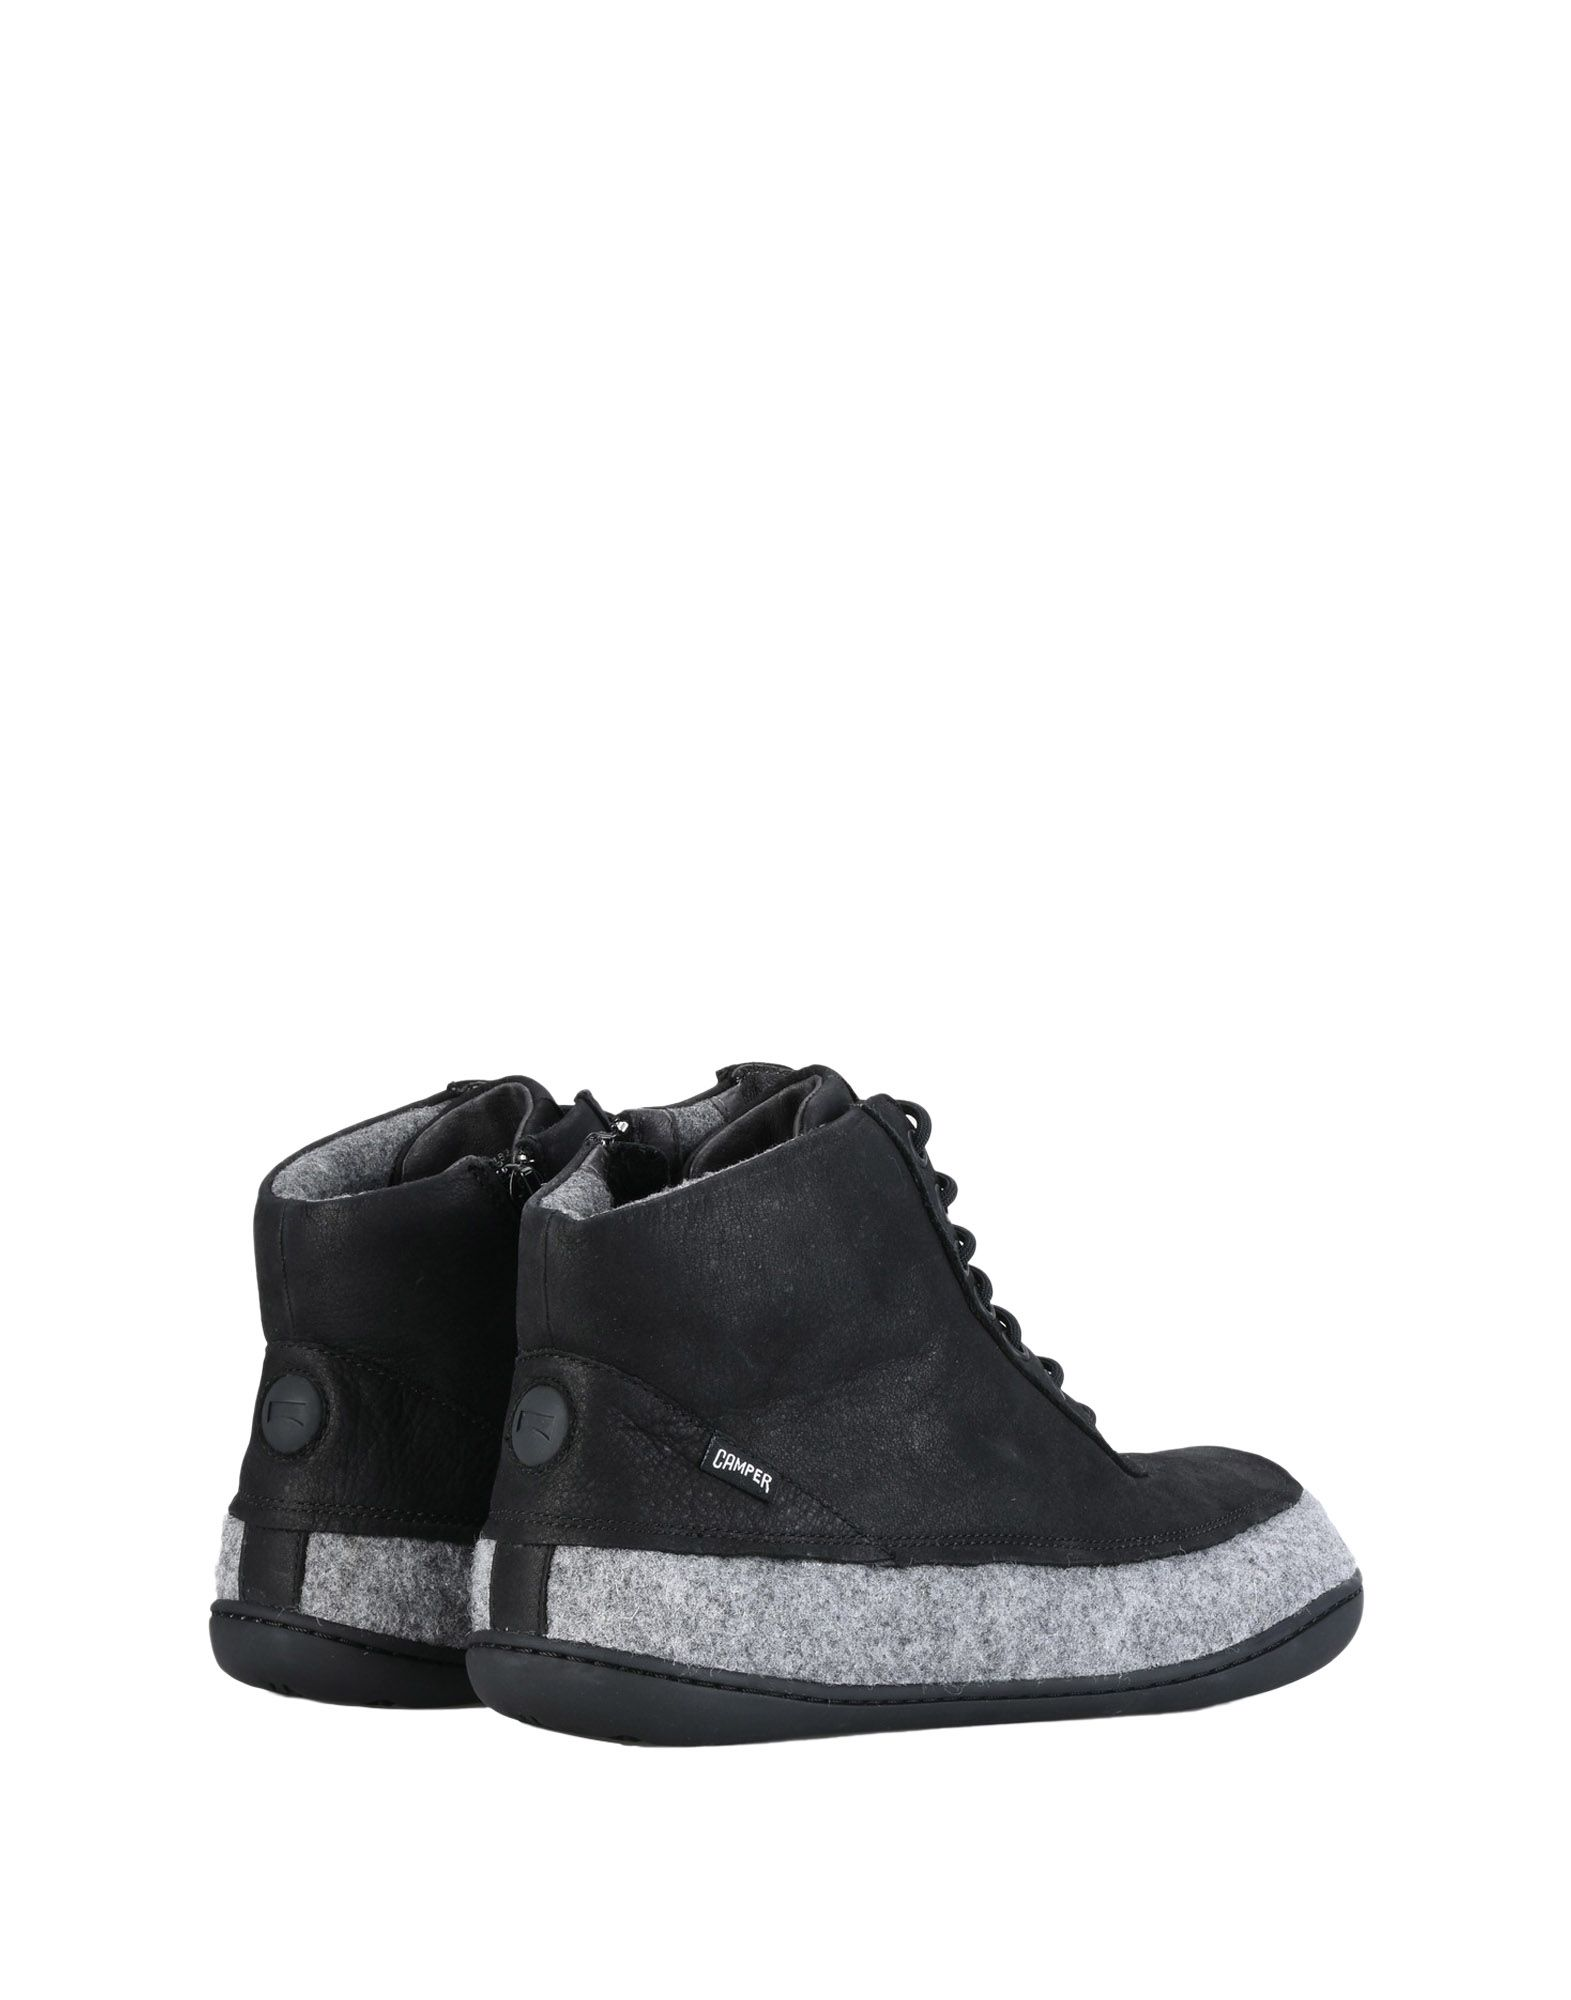 Rabatt echte Schuhe 11356414MC Camper Stiefelette Herren  11356414MC Schuhe b6036c